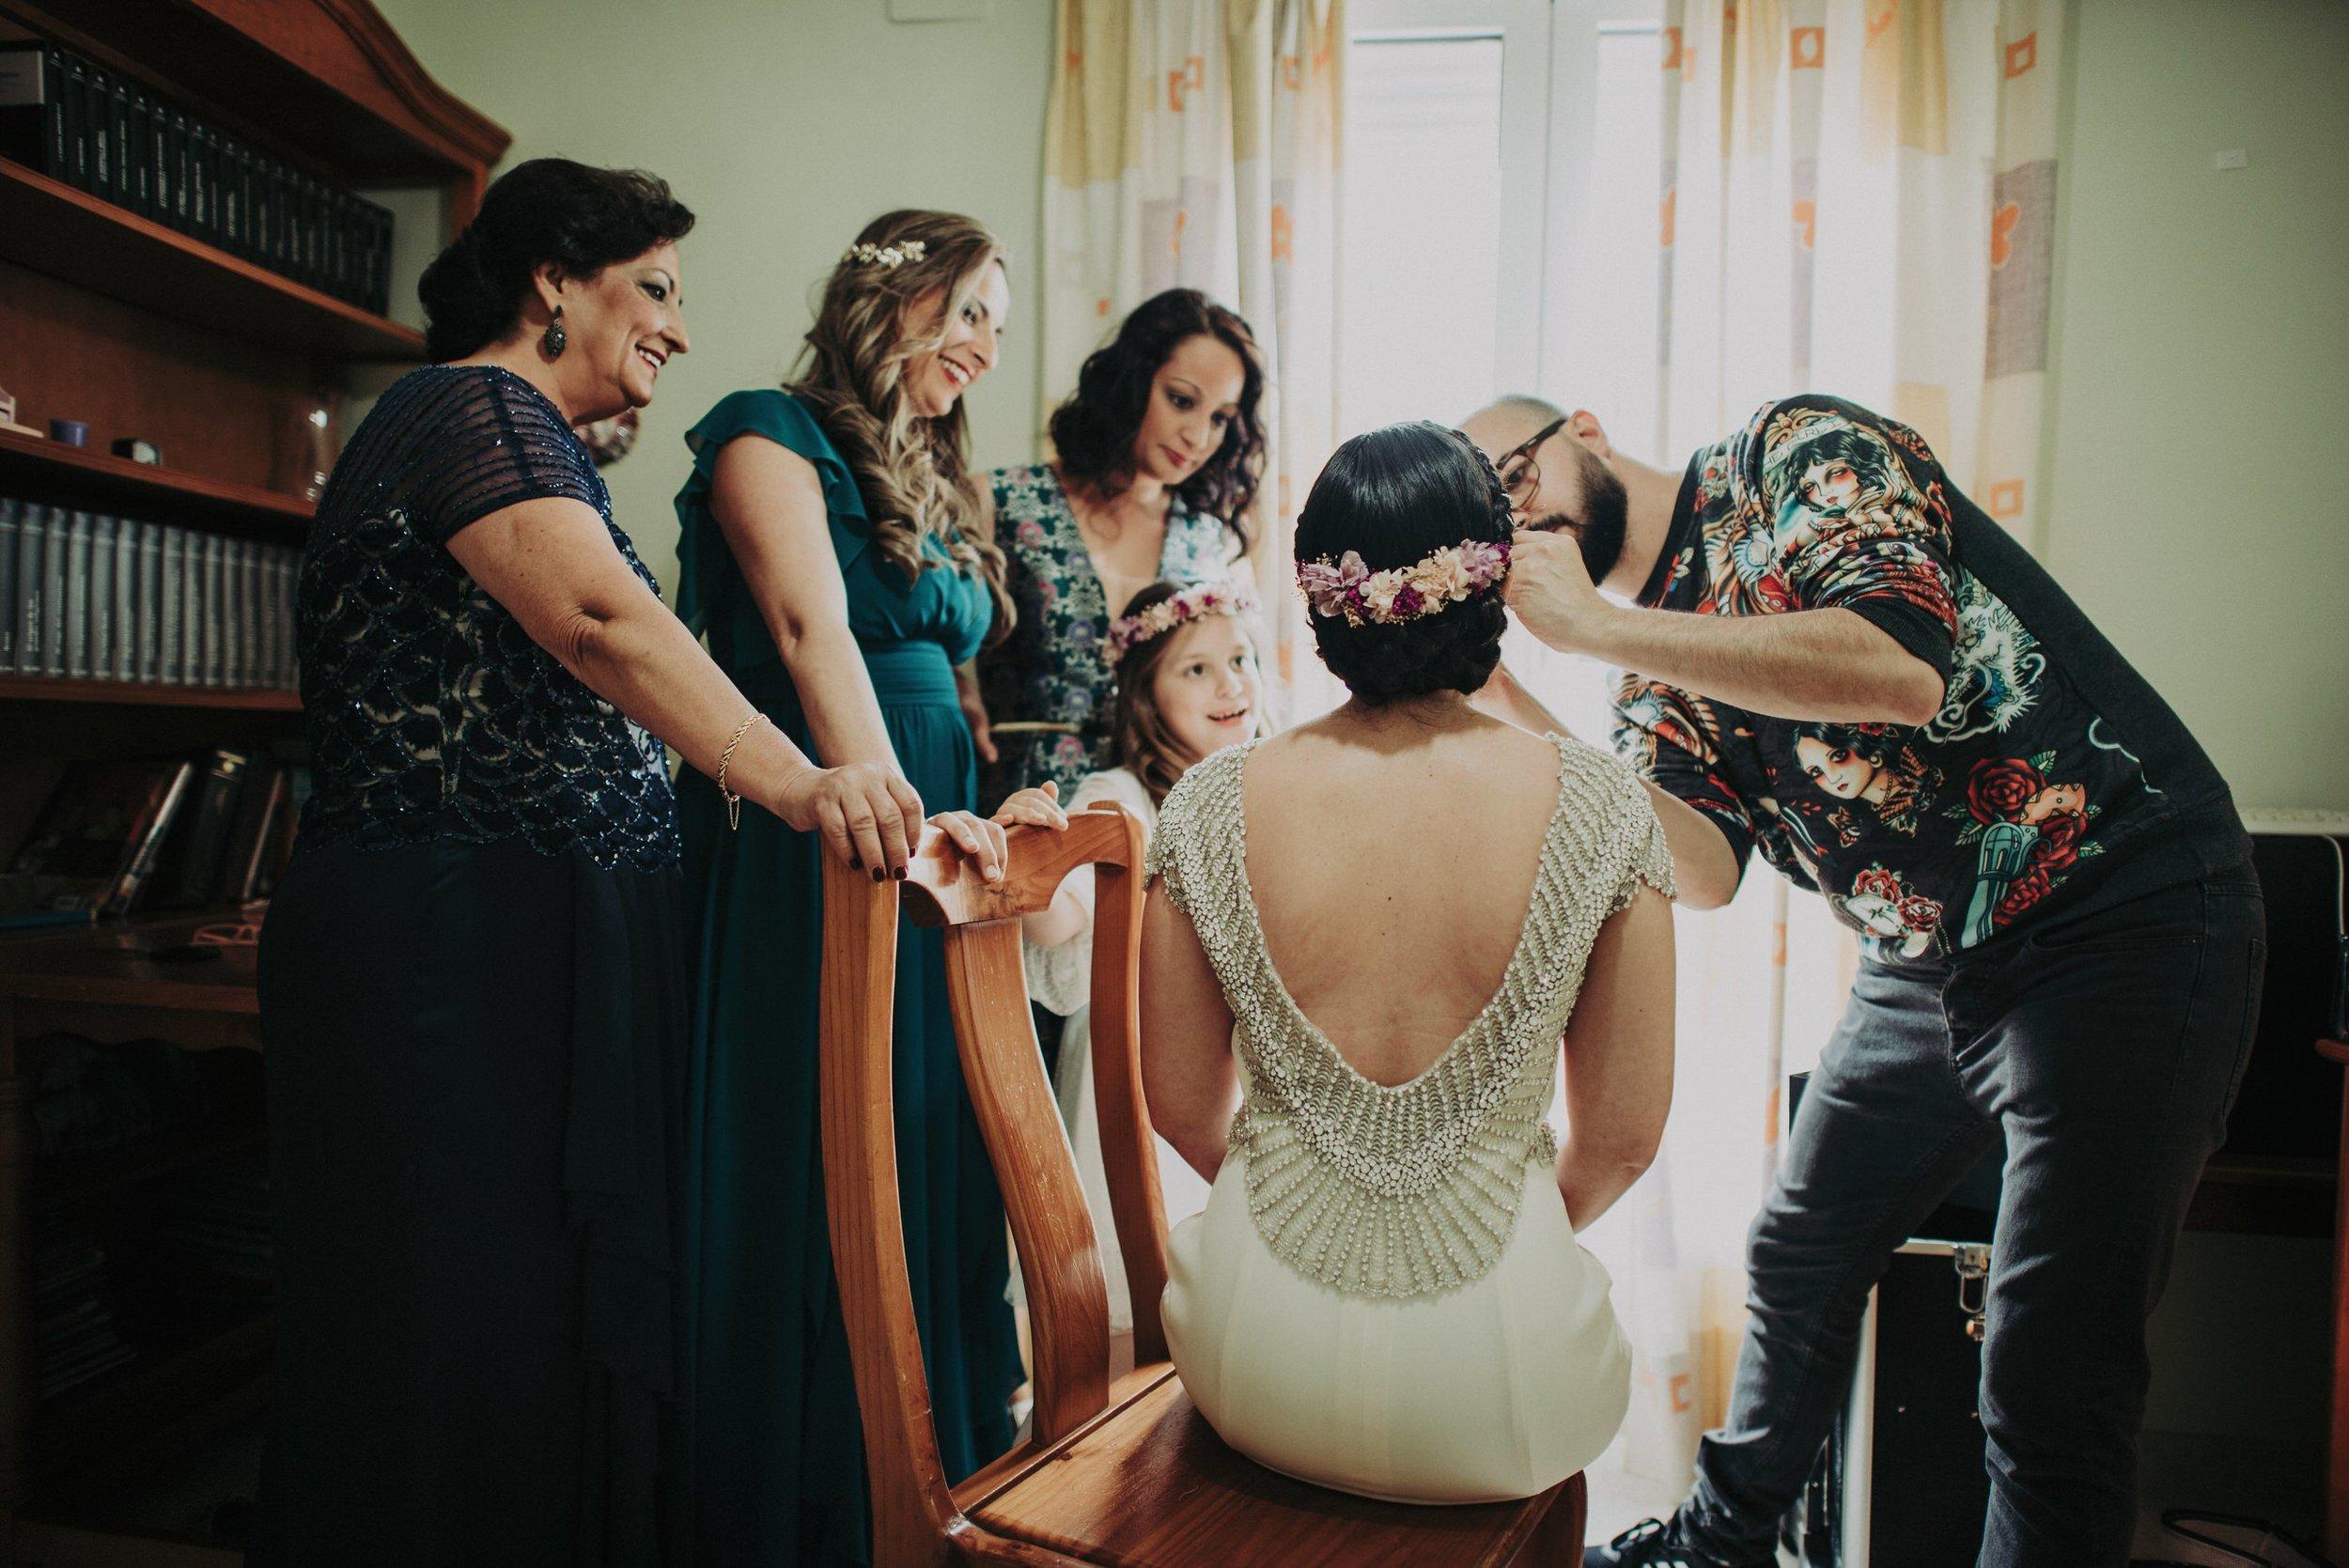 Laura & Rubén - boda en utrera - Santa clotilde- Manolo mayo - Fotografo de boda - Andrés Amarillo AAA_1075-Exposure (17).jpg